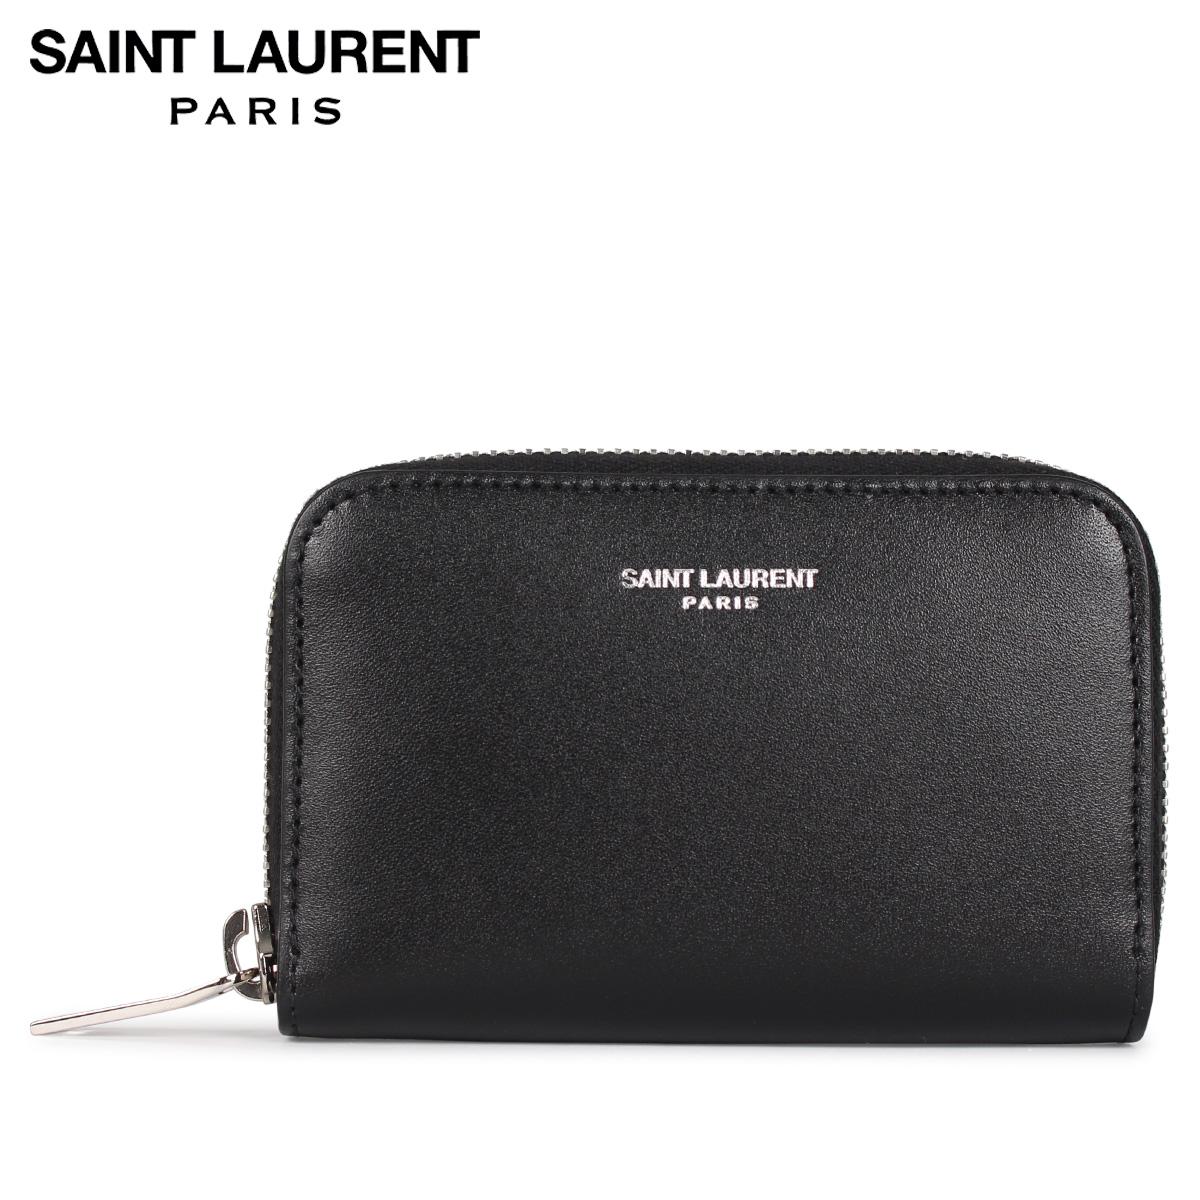 SAINT LAURENT PARIS サンローラン パリ 財布 コインケース 小銭入れ メンズ COIN CASE ブラック 黒 5065220U90N [4/14 新入荷]